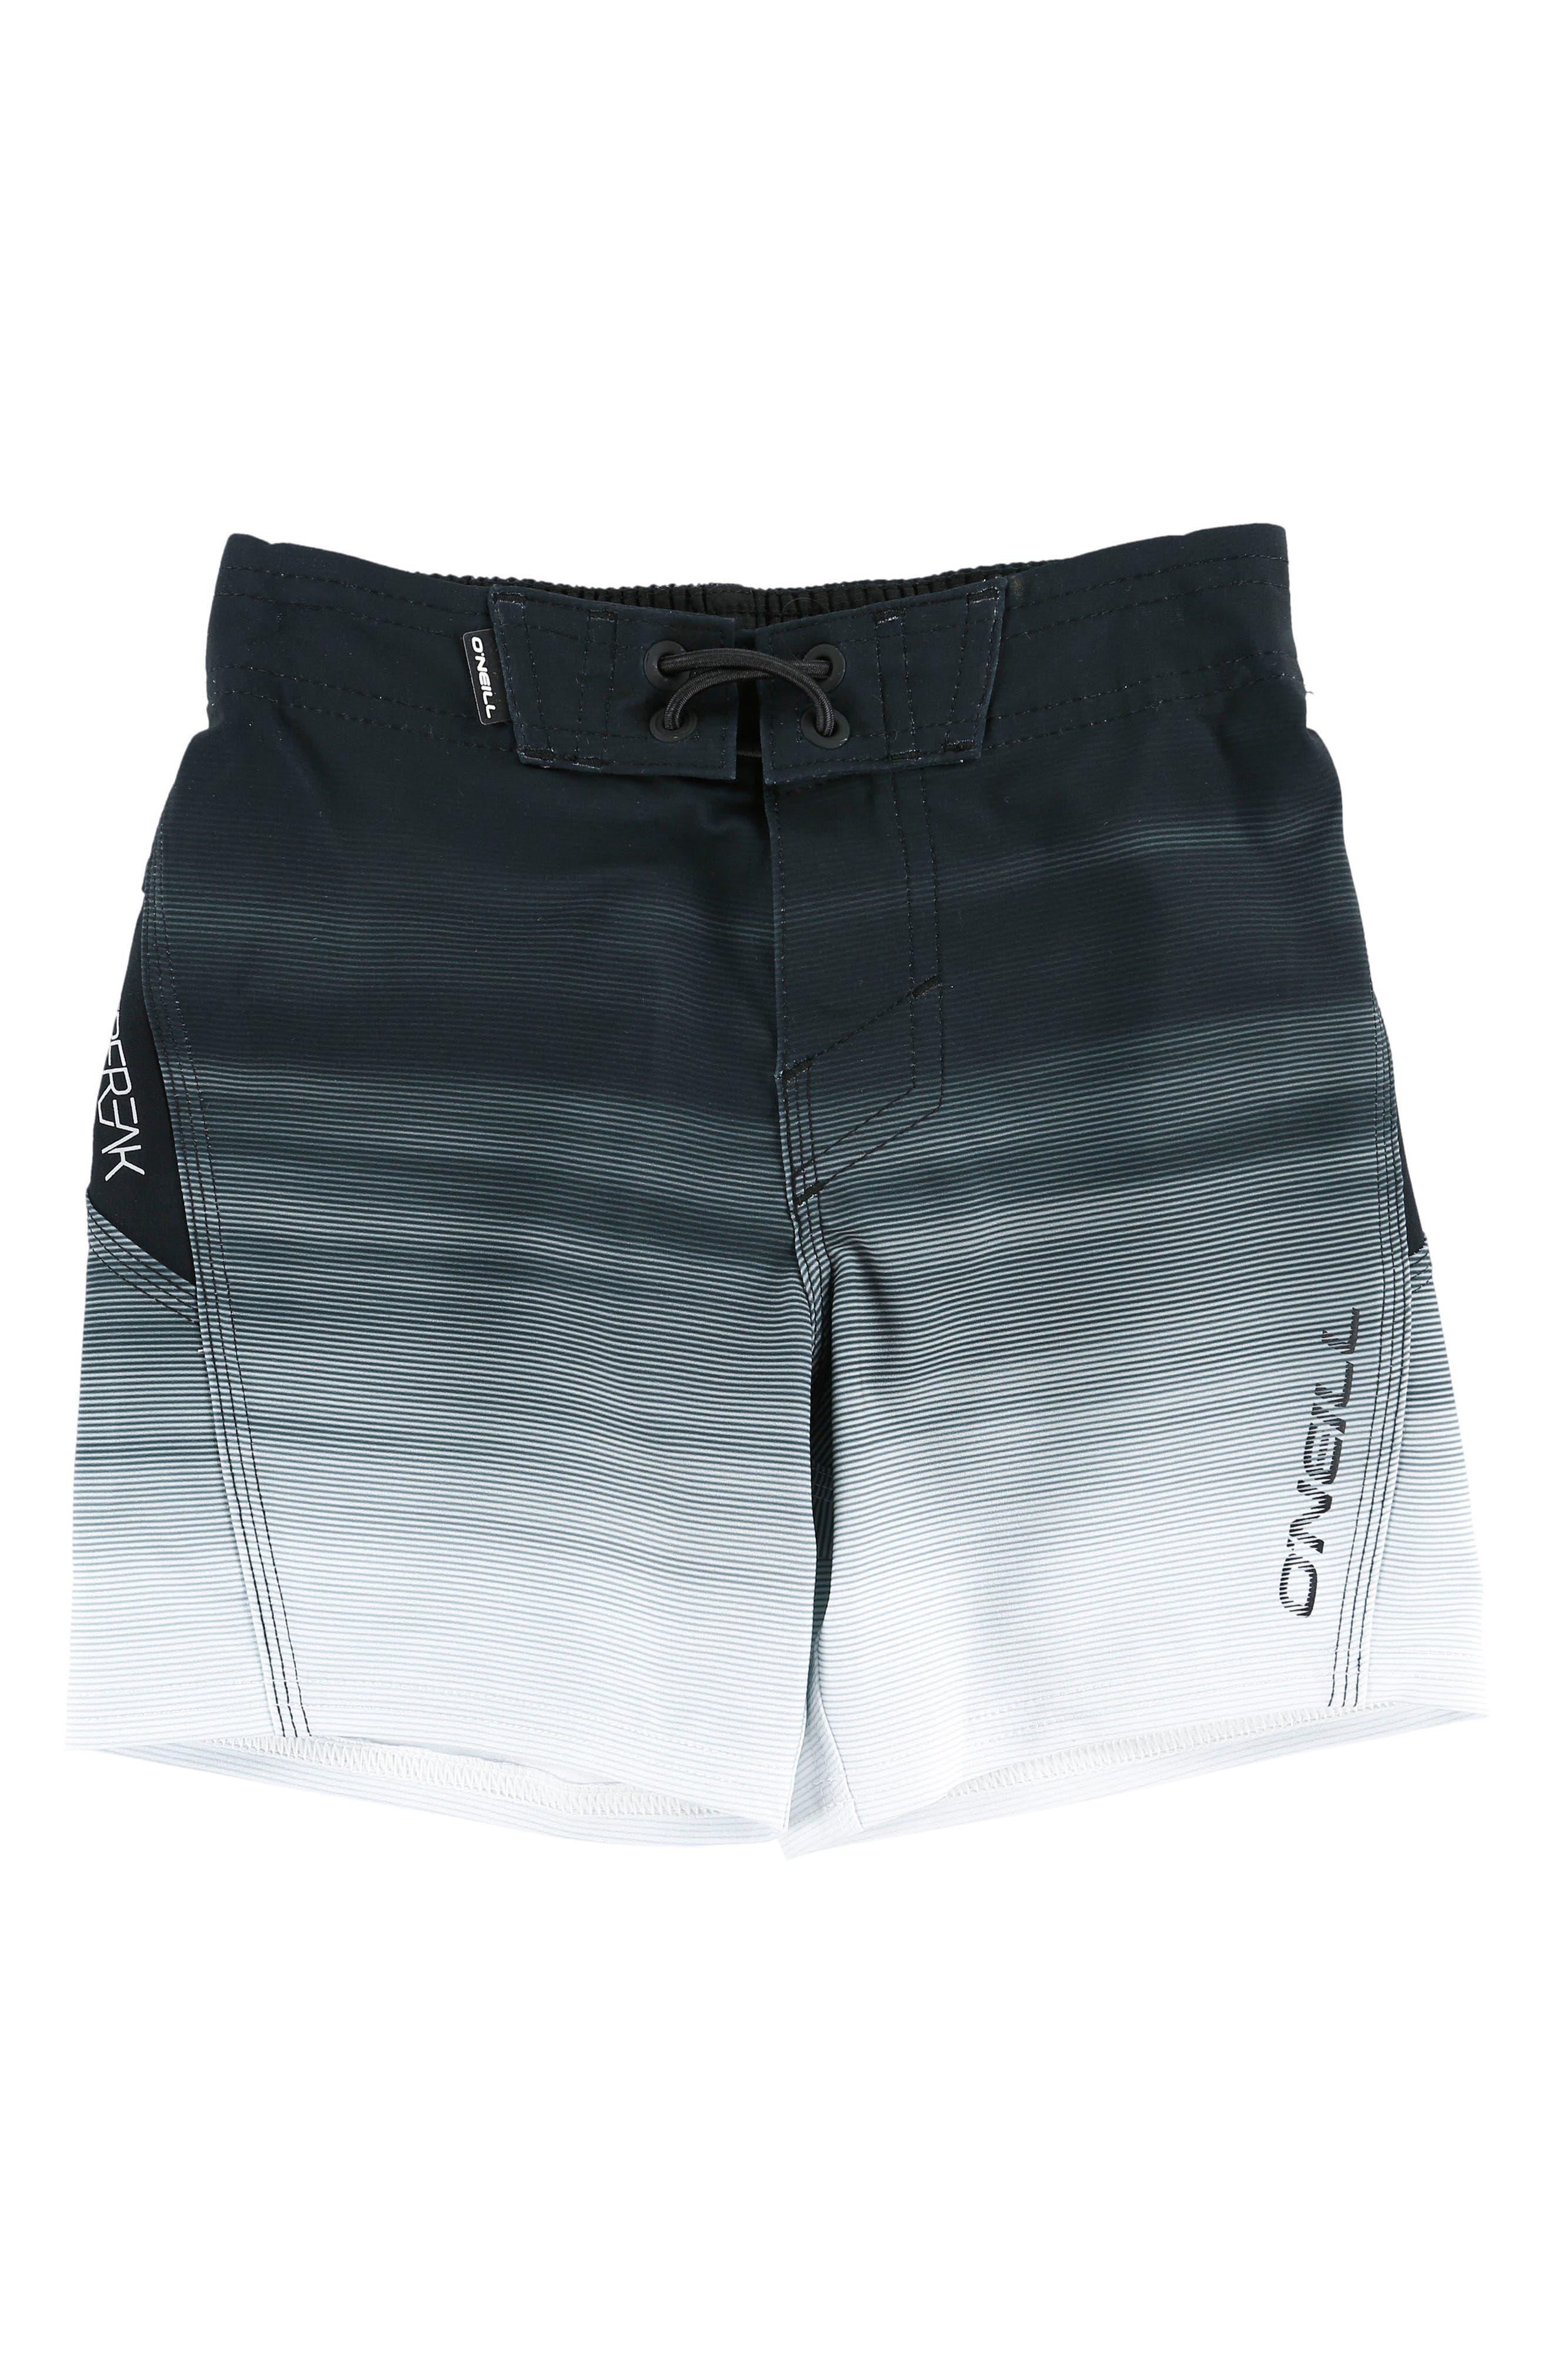 Sneakyfreak Mysto Board Shorts,                         Main,                         color, Black